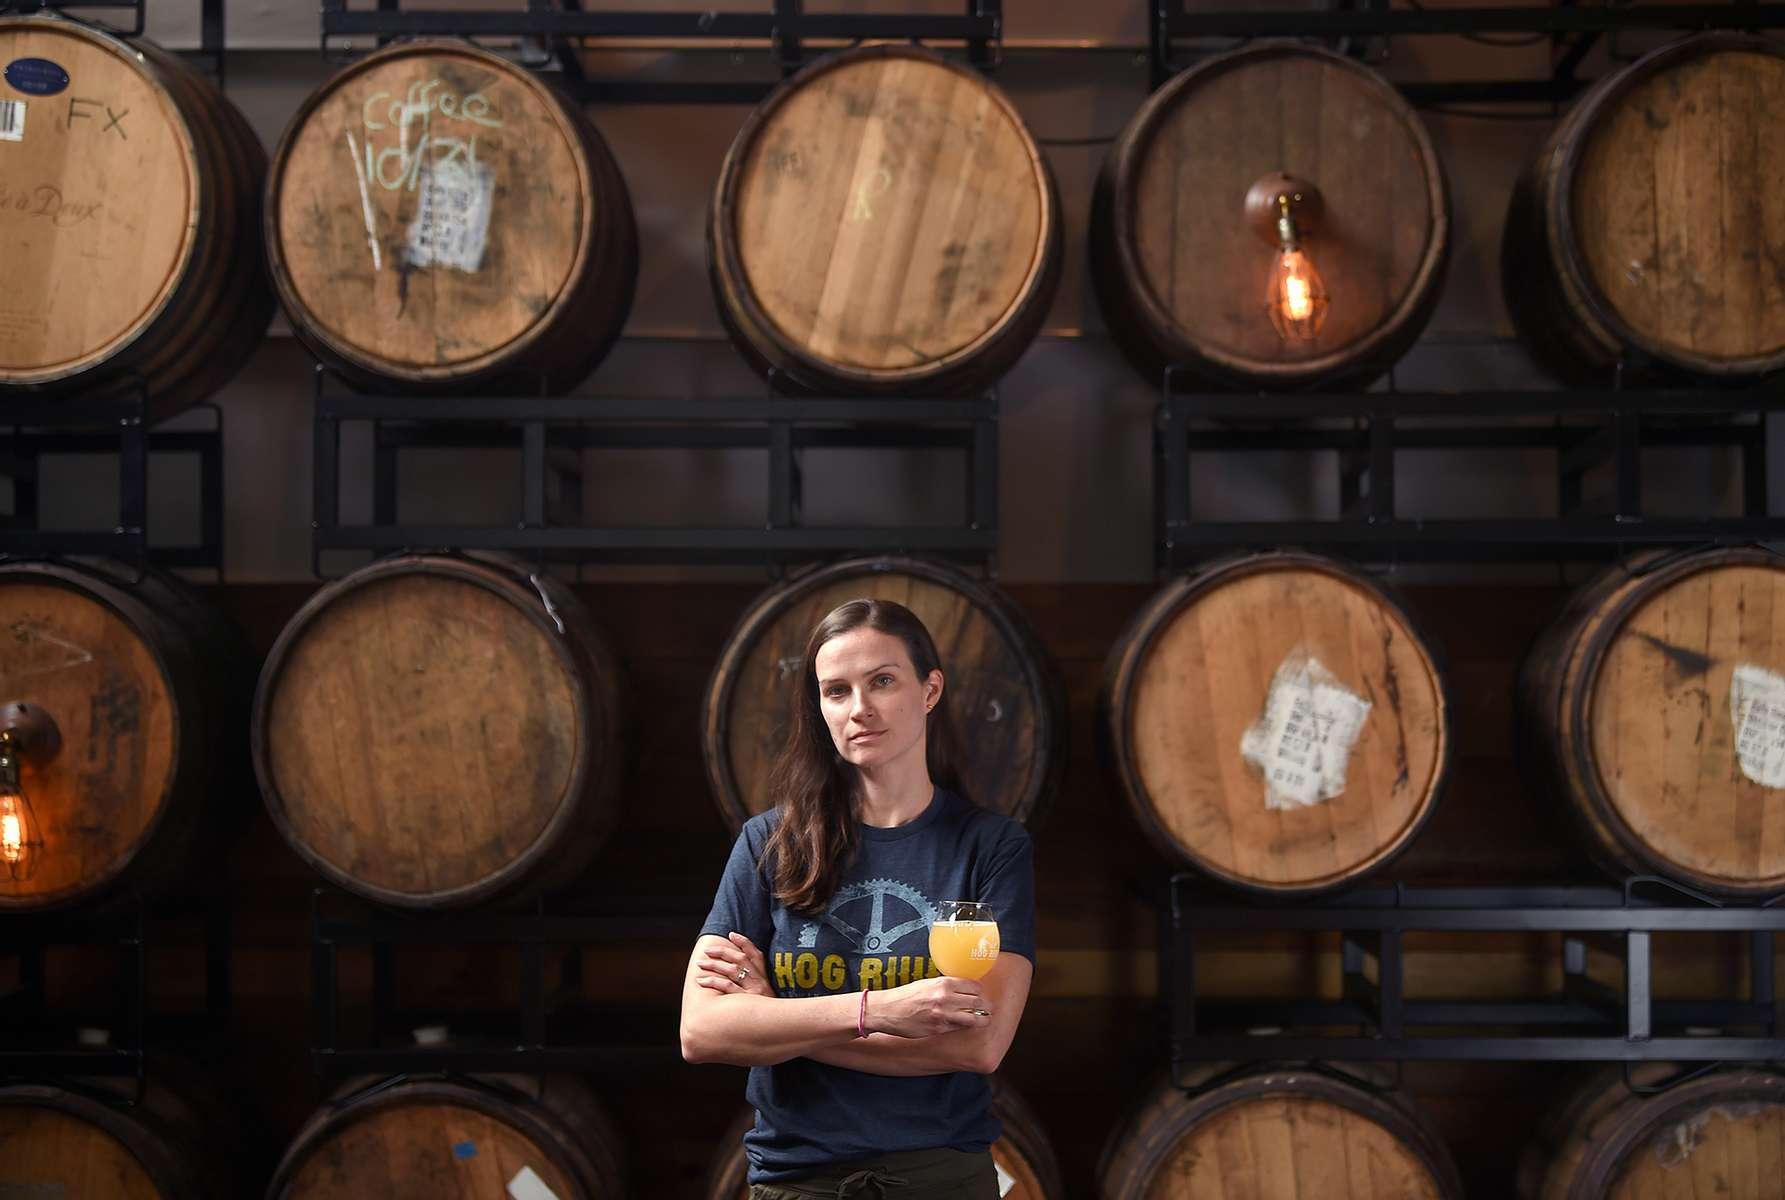 Hartford, CT - 5/28/21 - Joy Braddock is co-owner of Hog River Brewing Co. Photo by Brad Horrigan   bhorrigan@courant.com